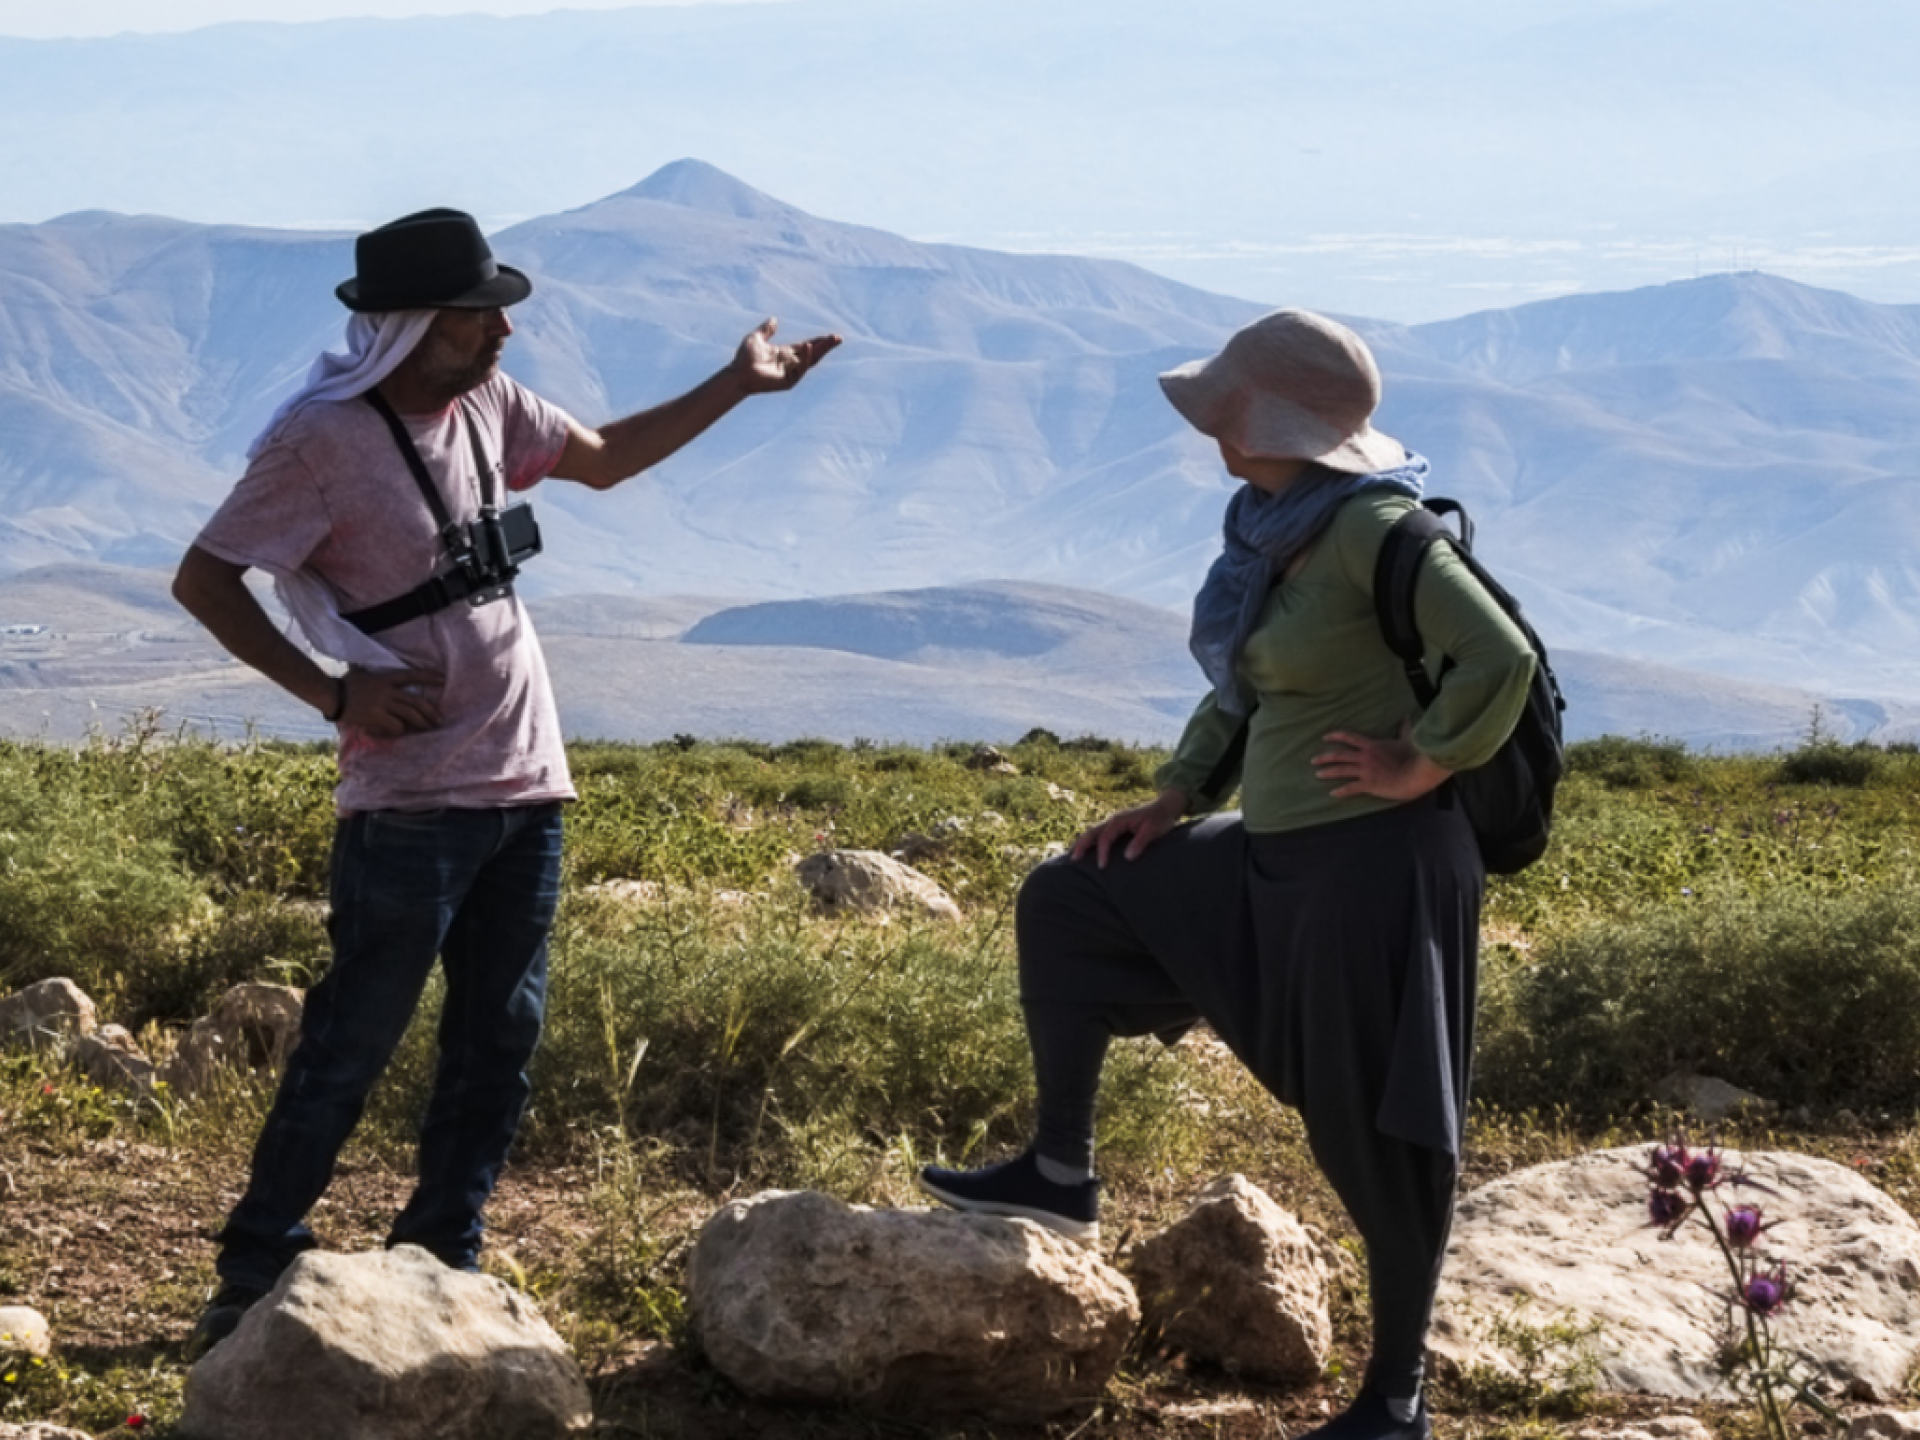 Jordan valley: Guy and Tamara, who accompanied the Palestinians herd,  enjoying the view